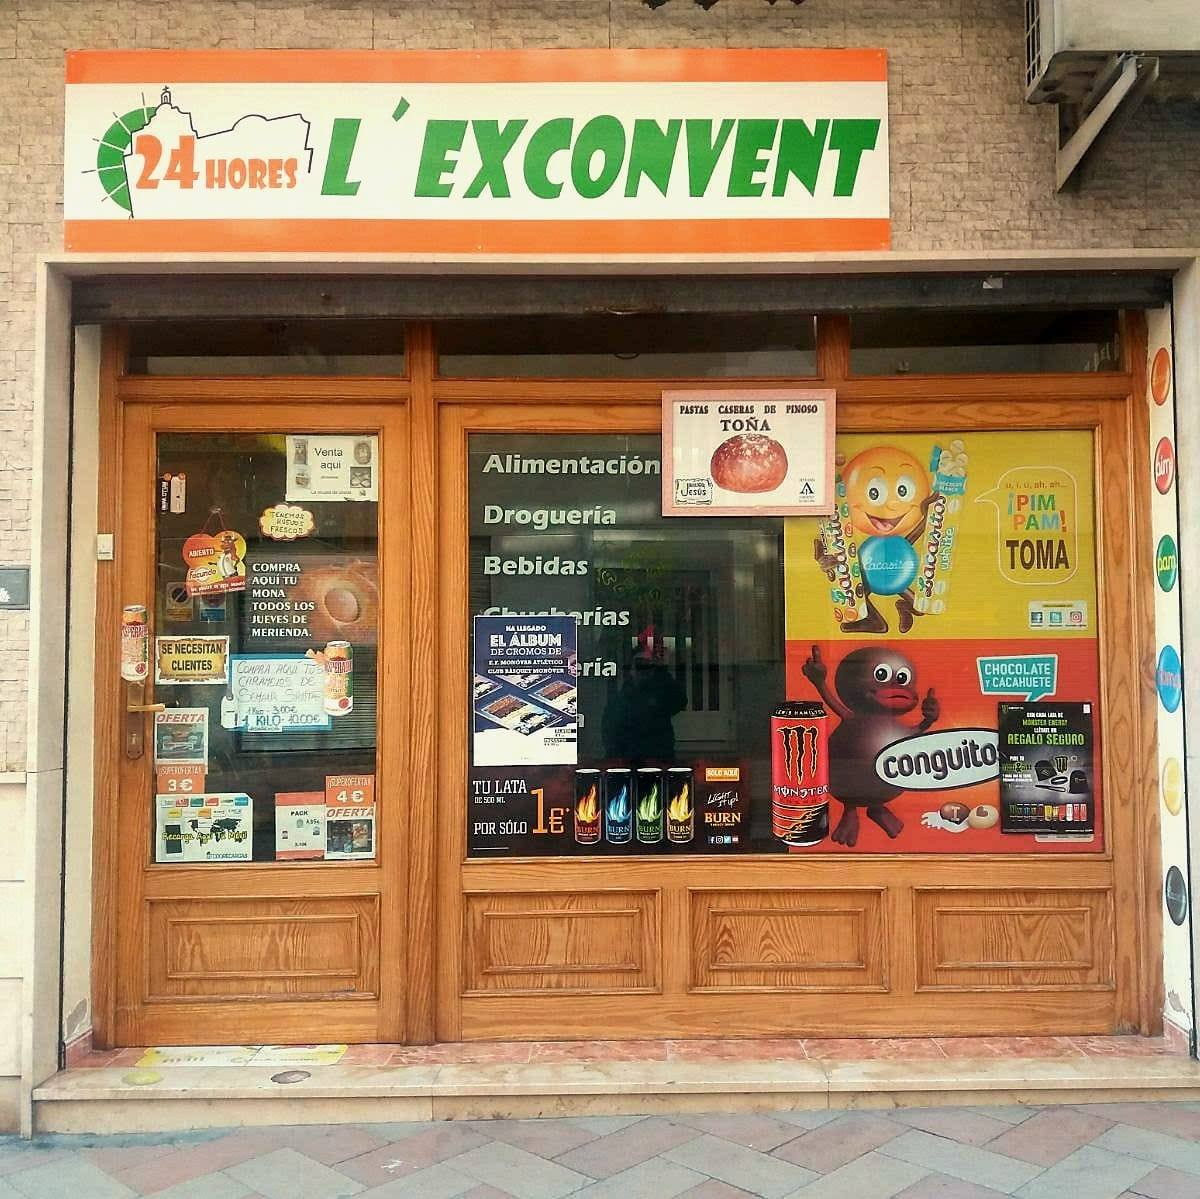 24 Hores L'Exconvent Logo